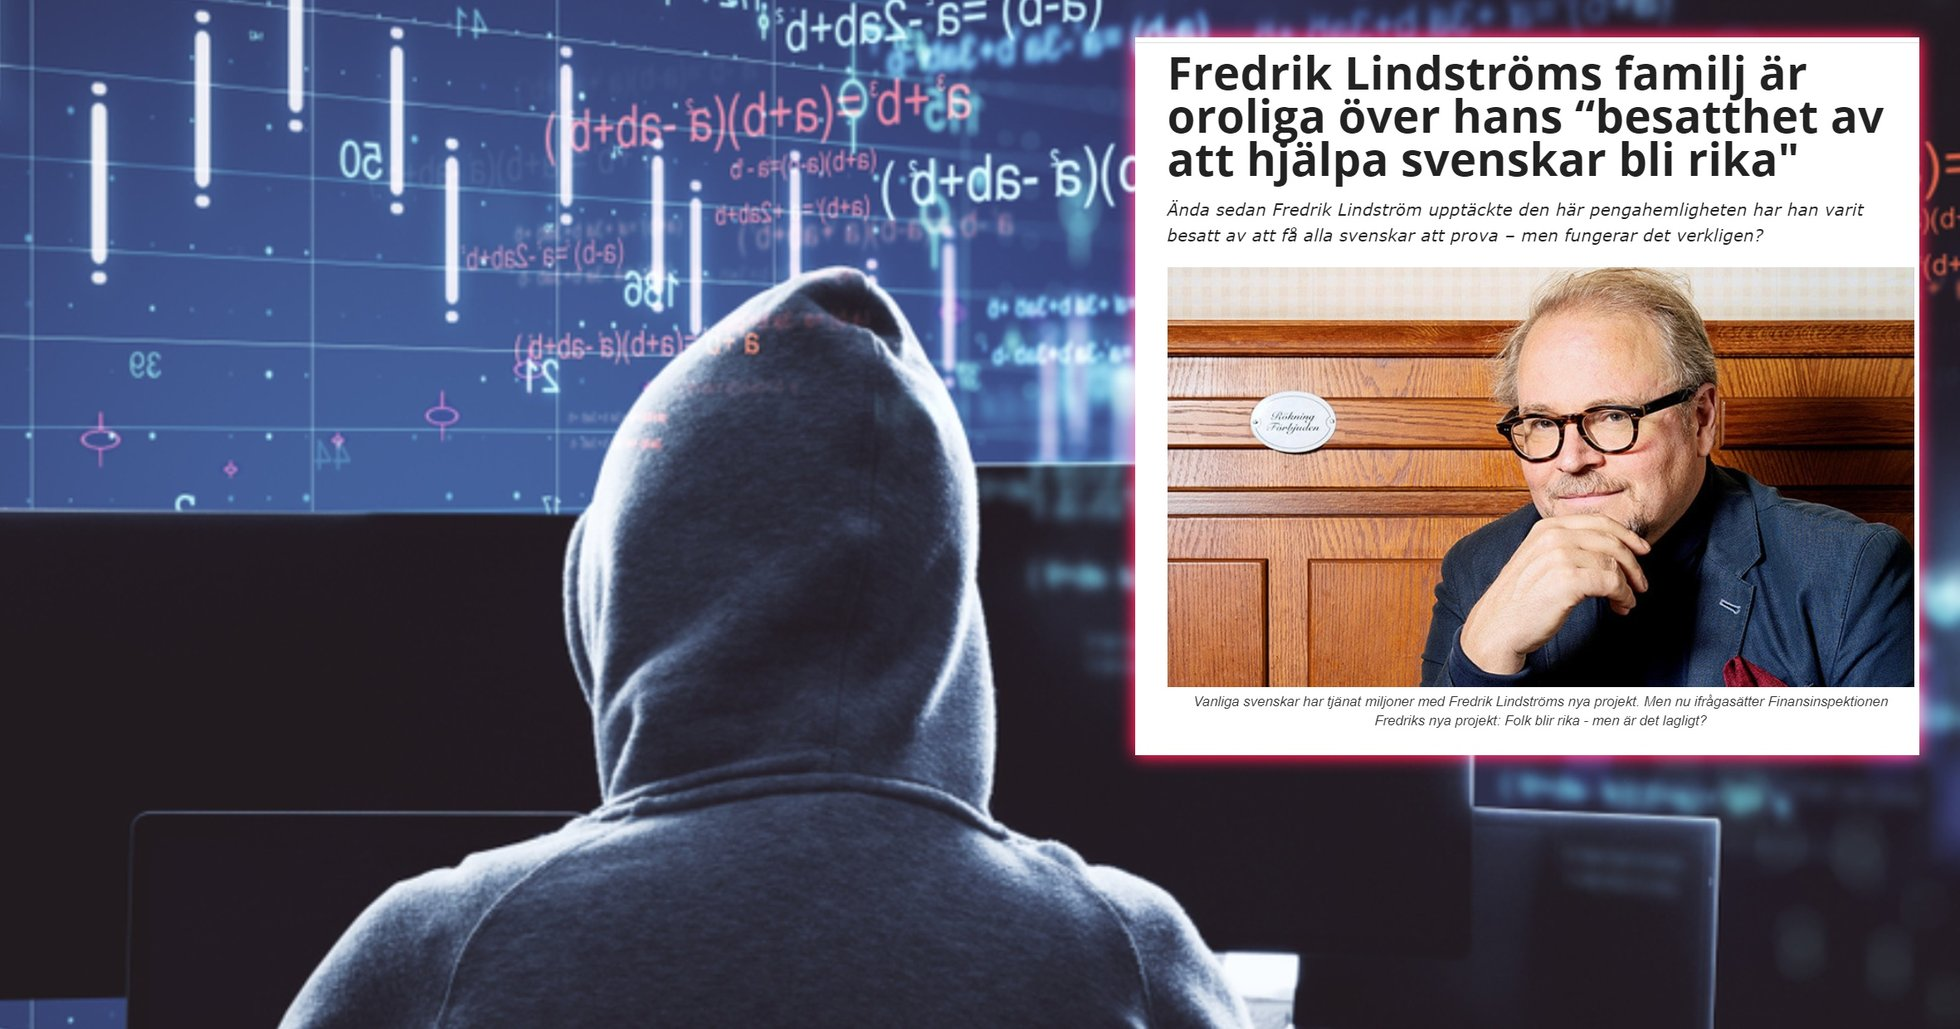 Tv-profilen Fredrik Lindström utnyttjas i bedrägeriet Immediate Edge